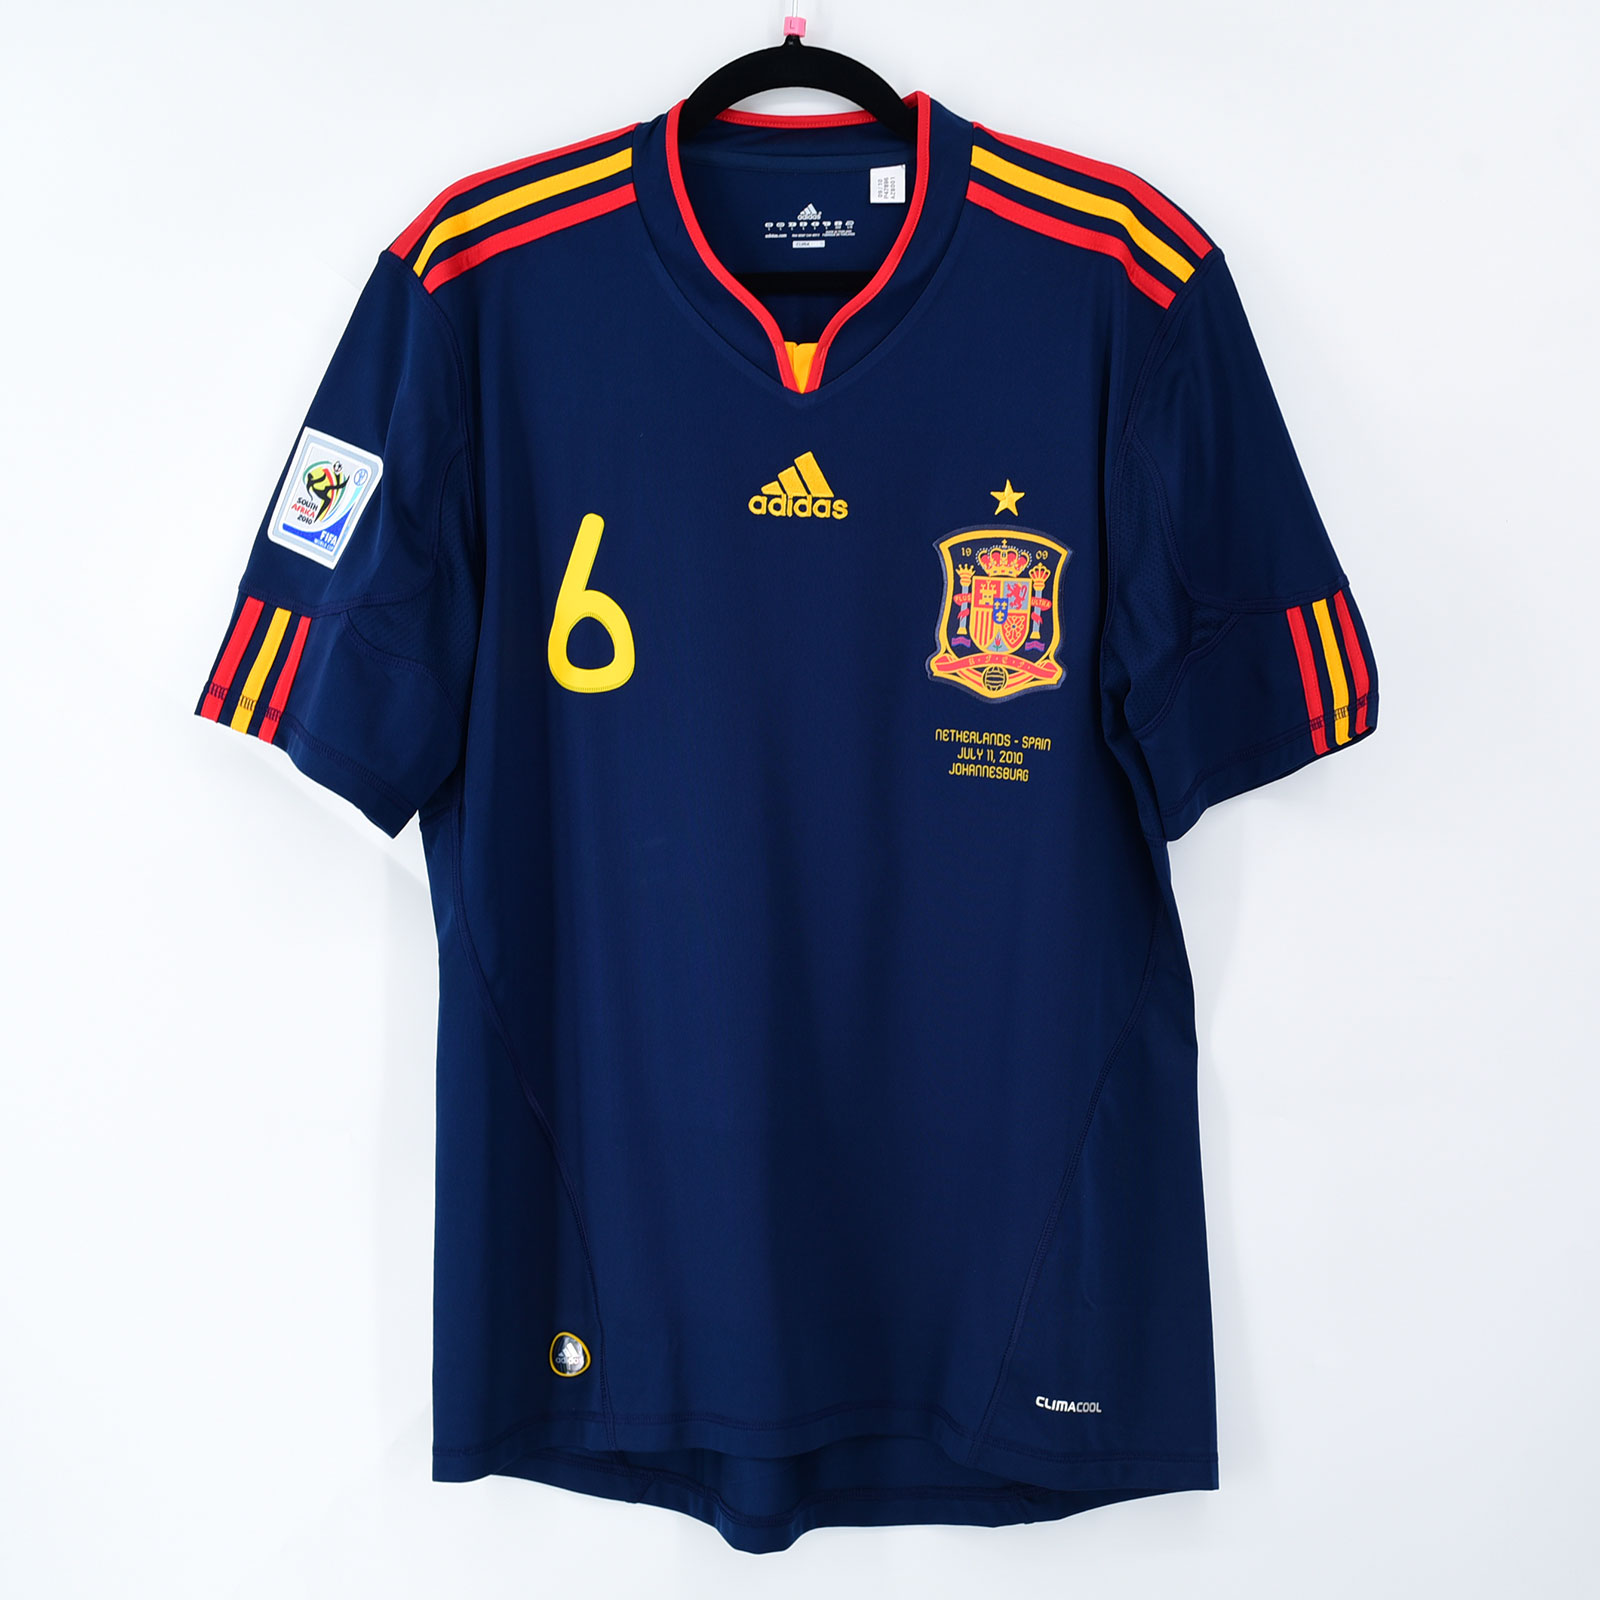 Final World Cup 2010 South Africa Spain Away Shirt #6 A. INIESTA (New) L Adidas